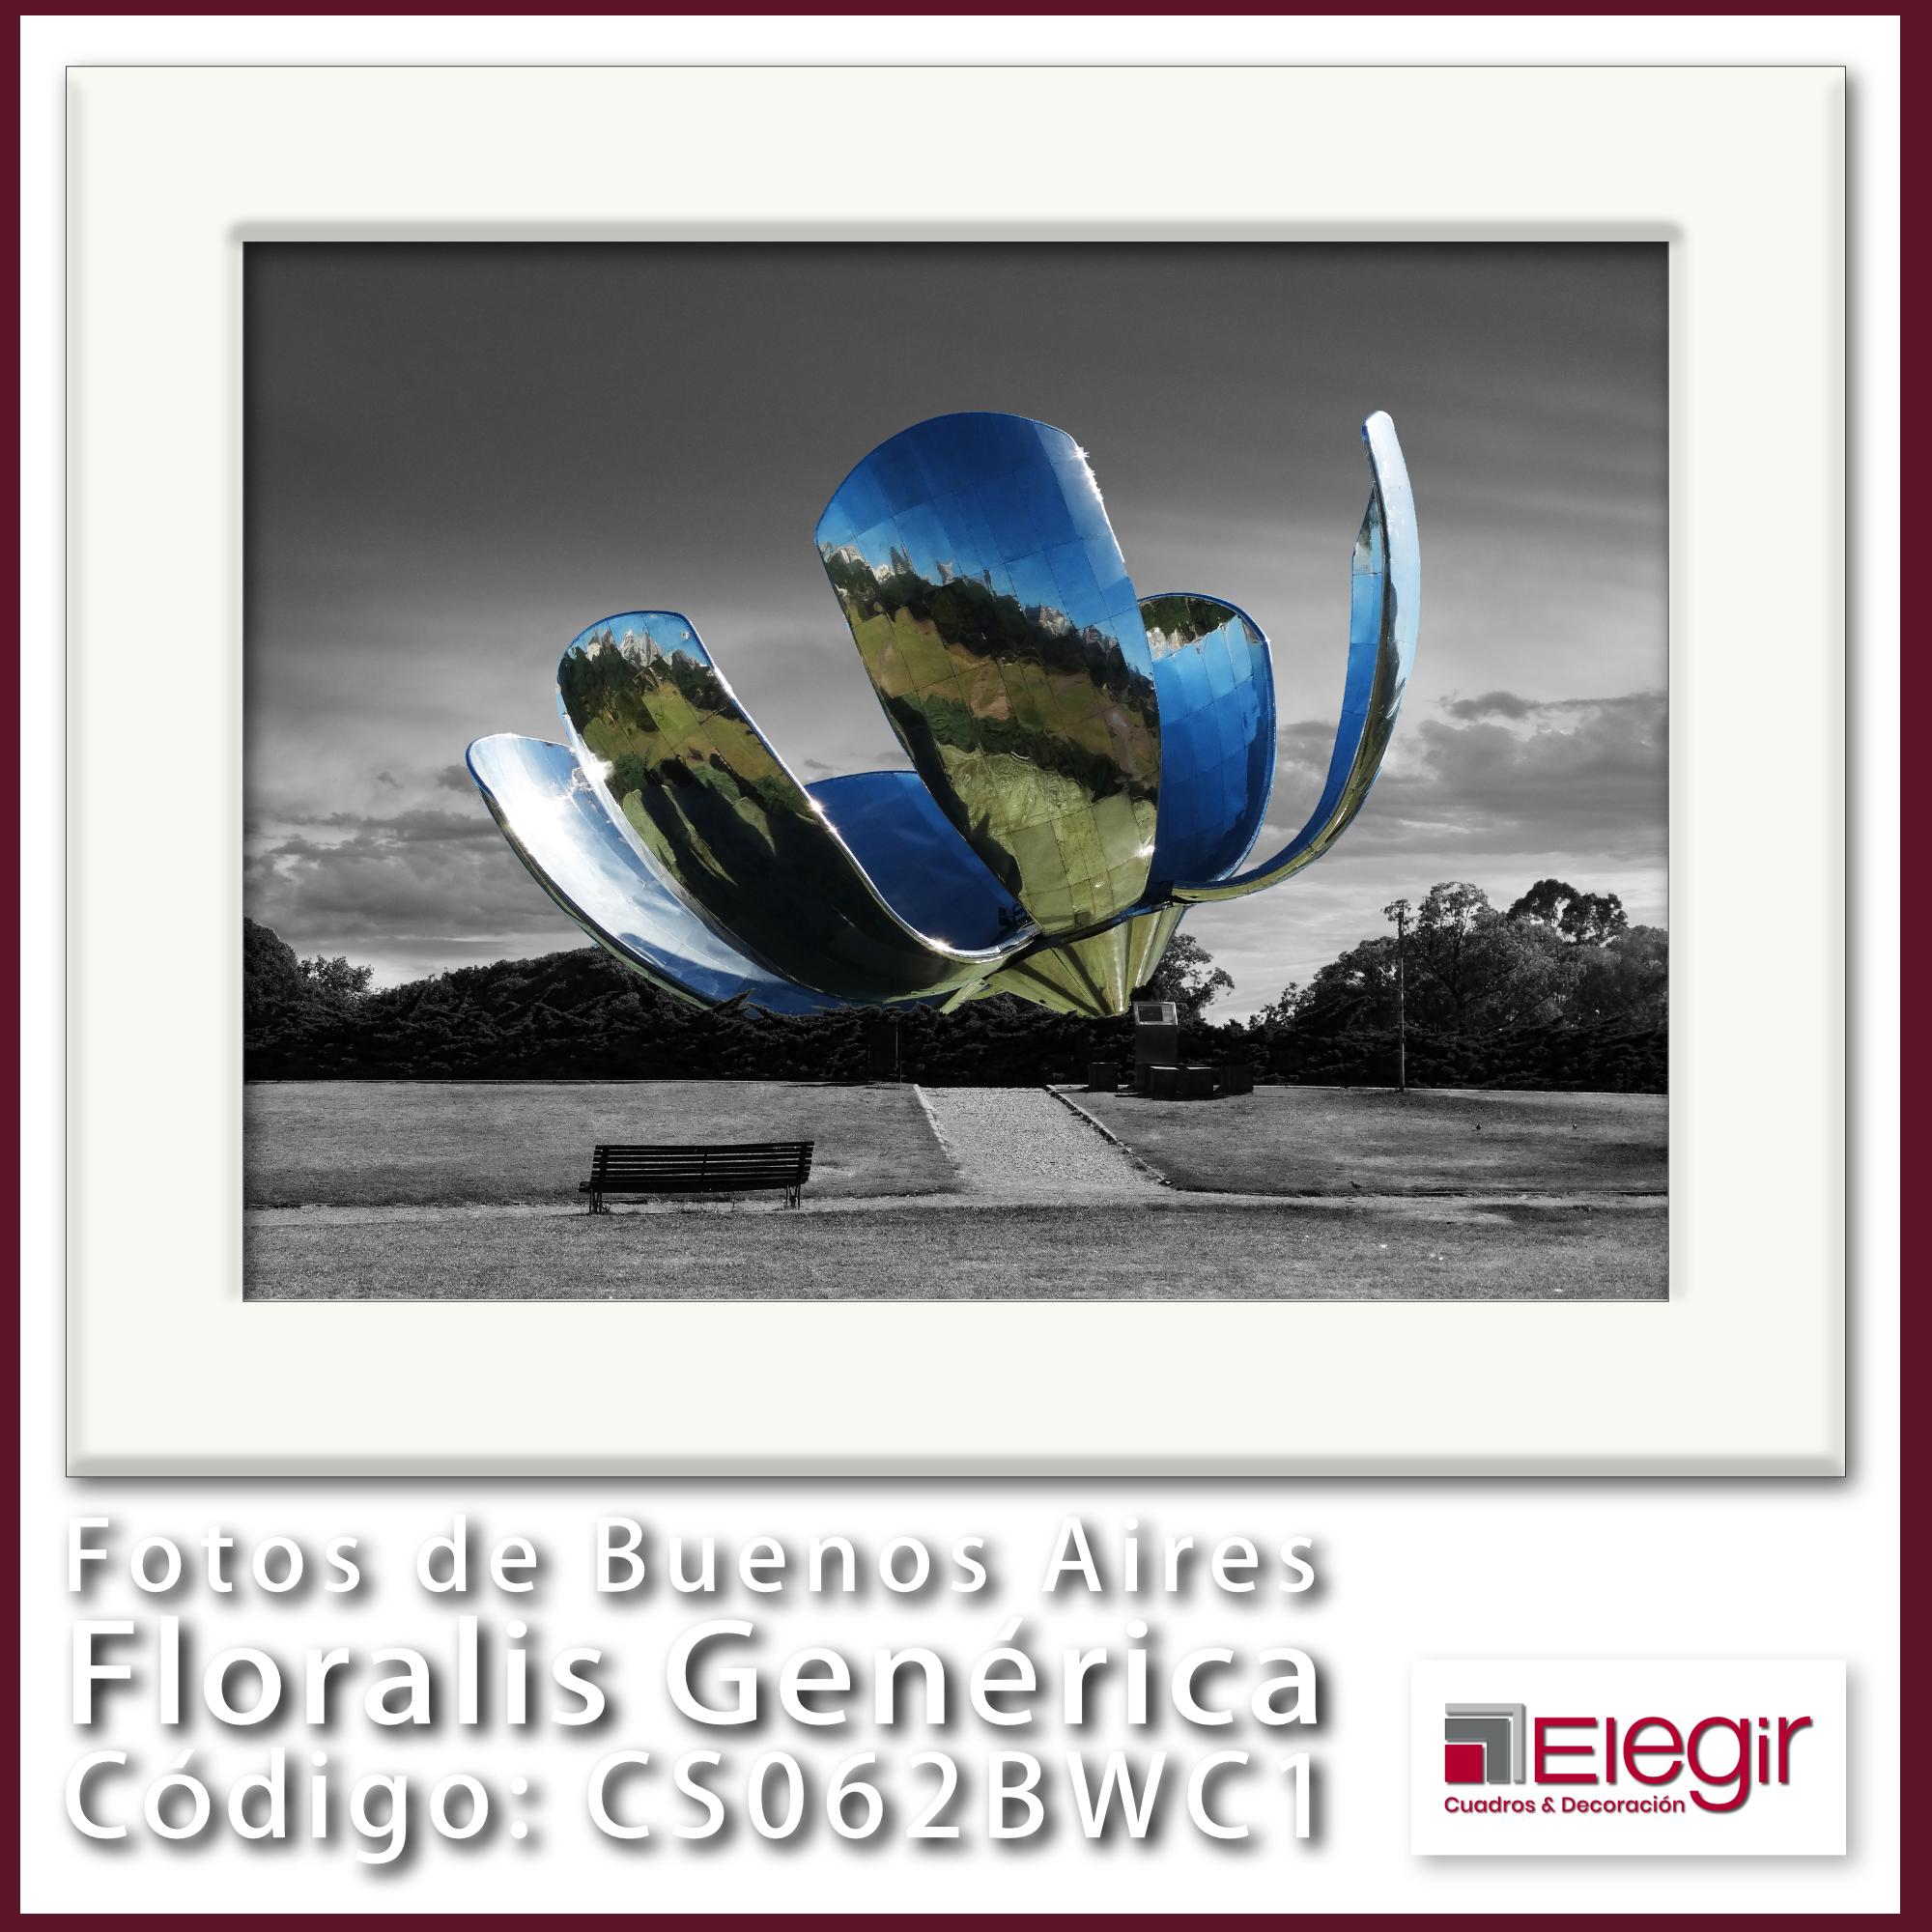 B CS062BWC1 Floralis Generica 40x30